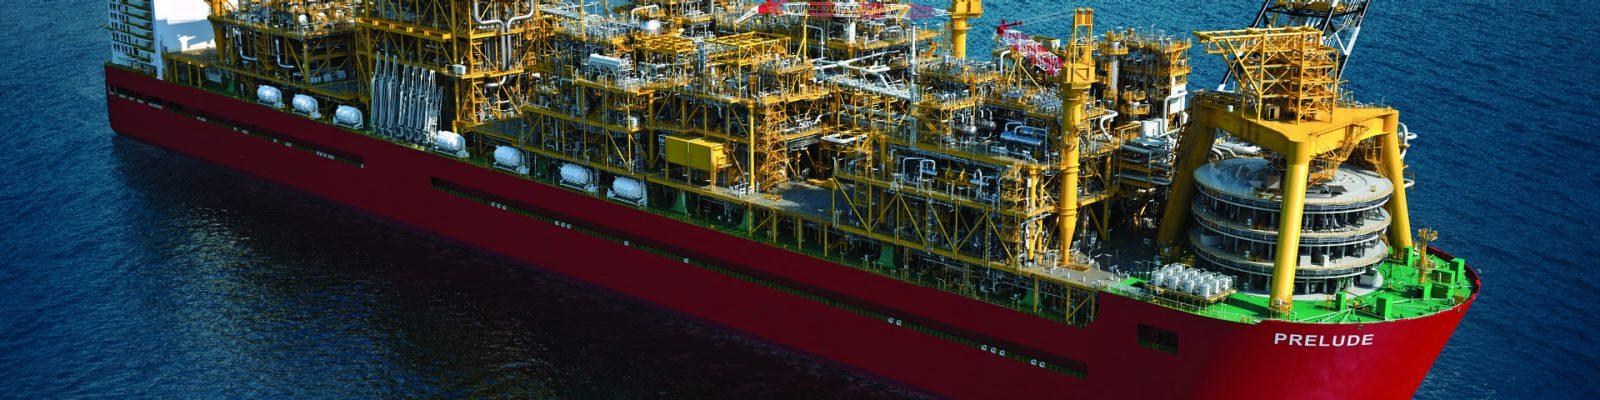 Digital impression of Prelude FLNG facility at sea